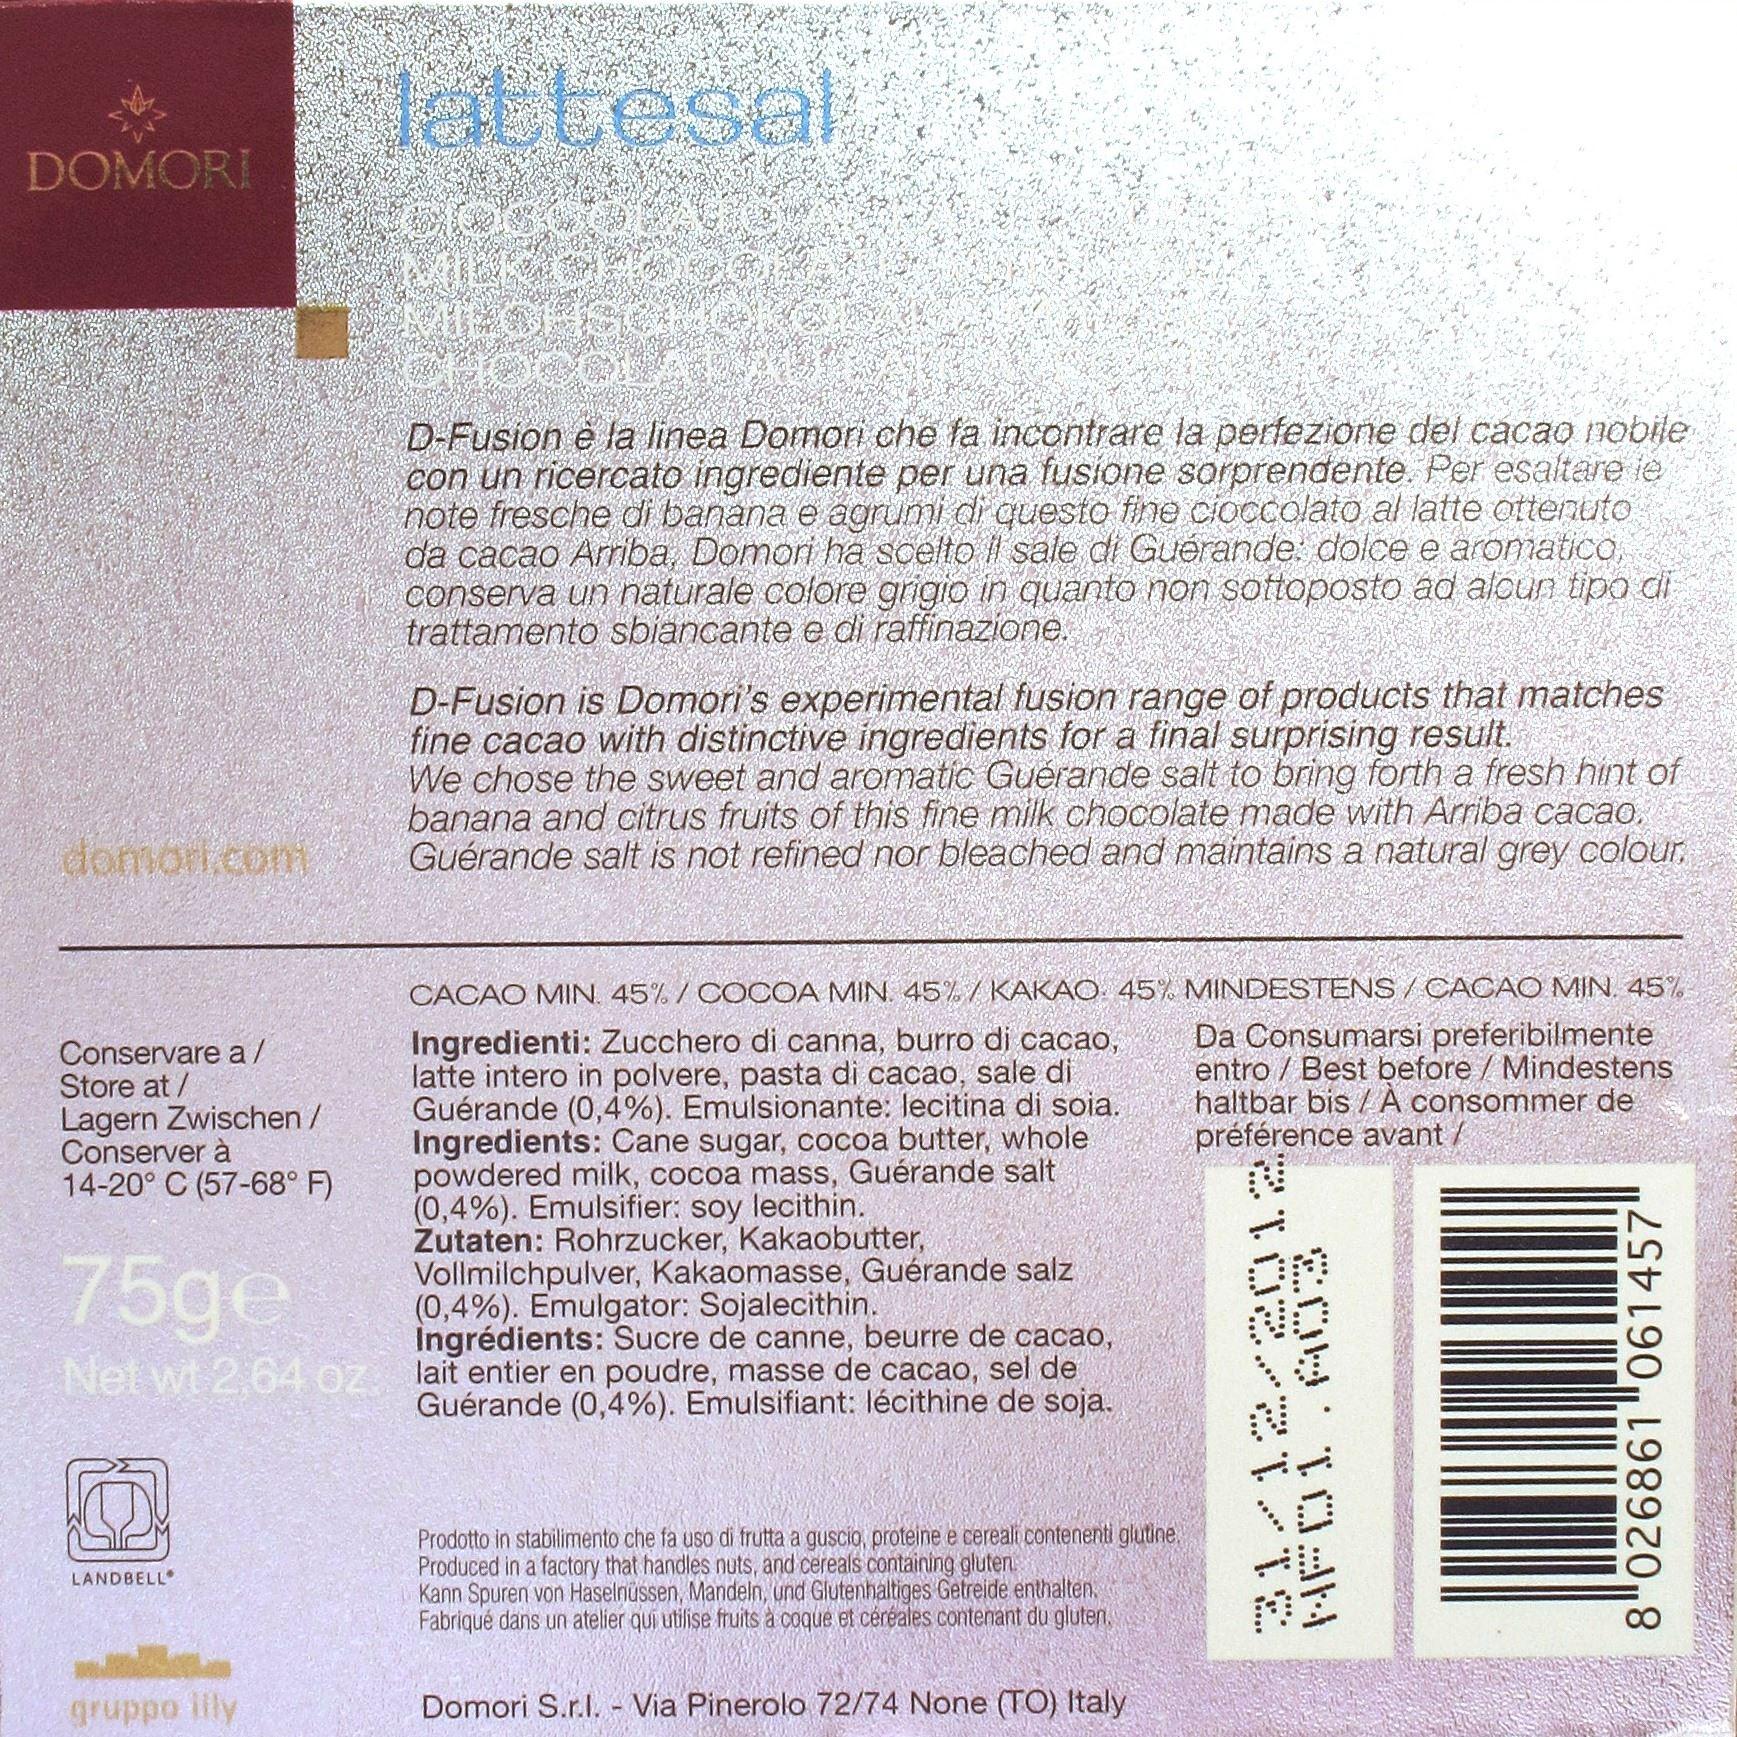 Domori D-Fusion Lattesal: Back